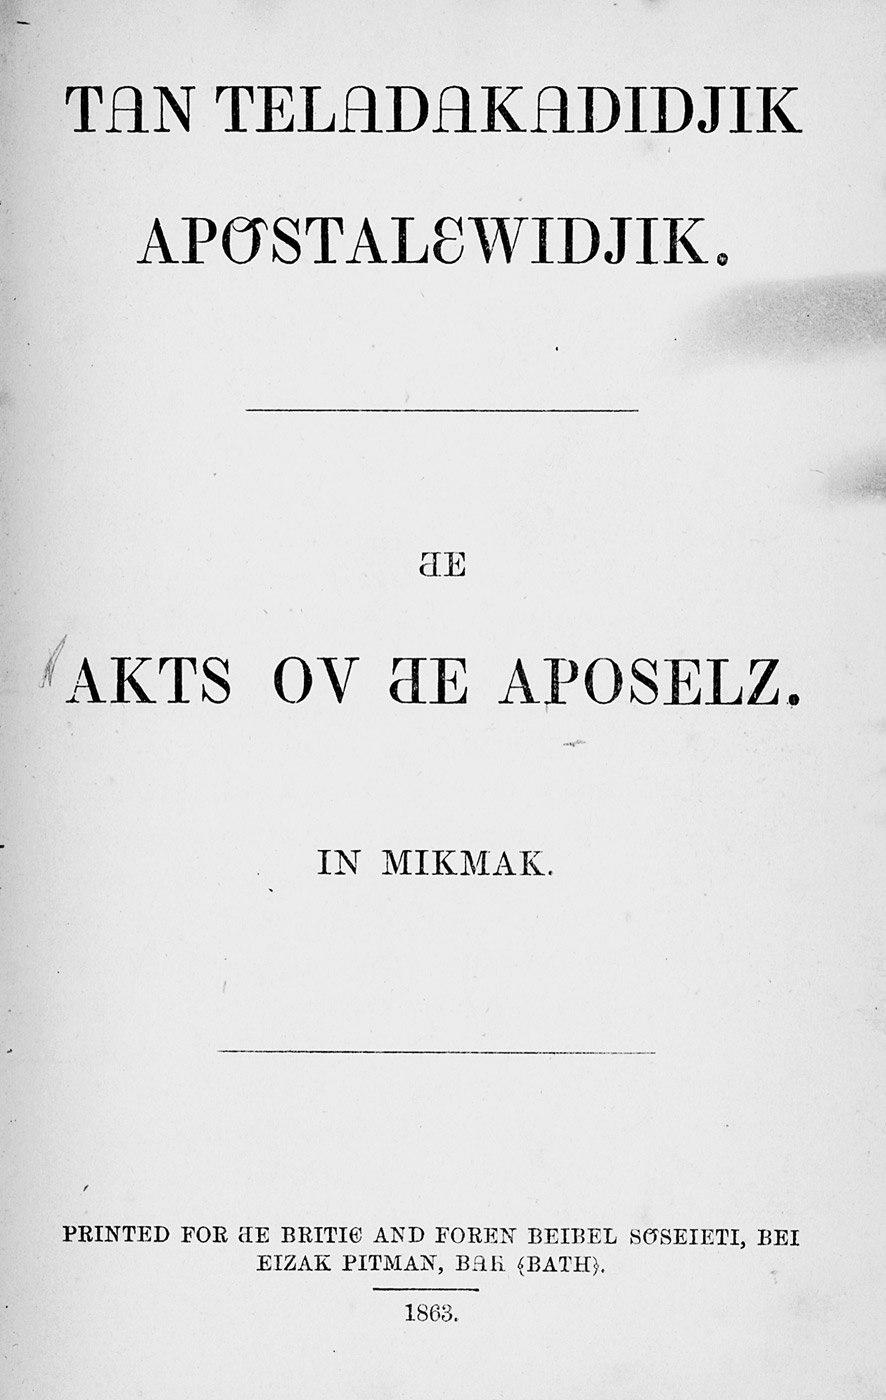 Tan teladakadidjik apostalewidjik 1863